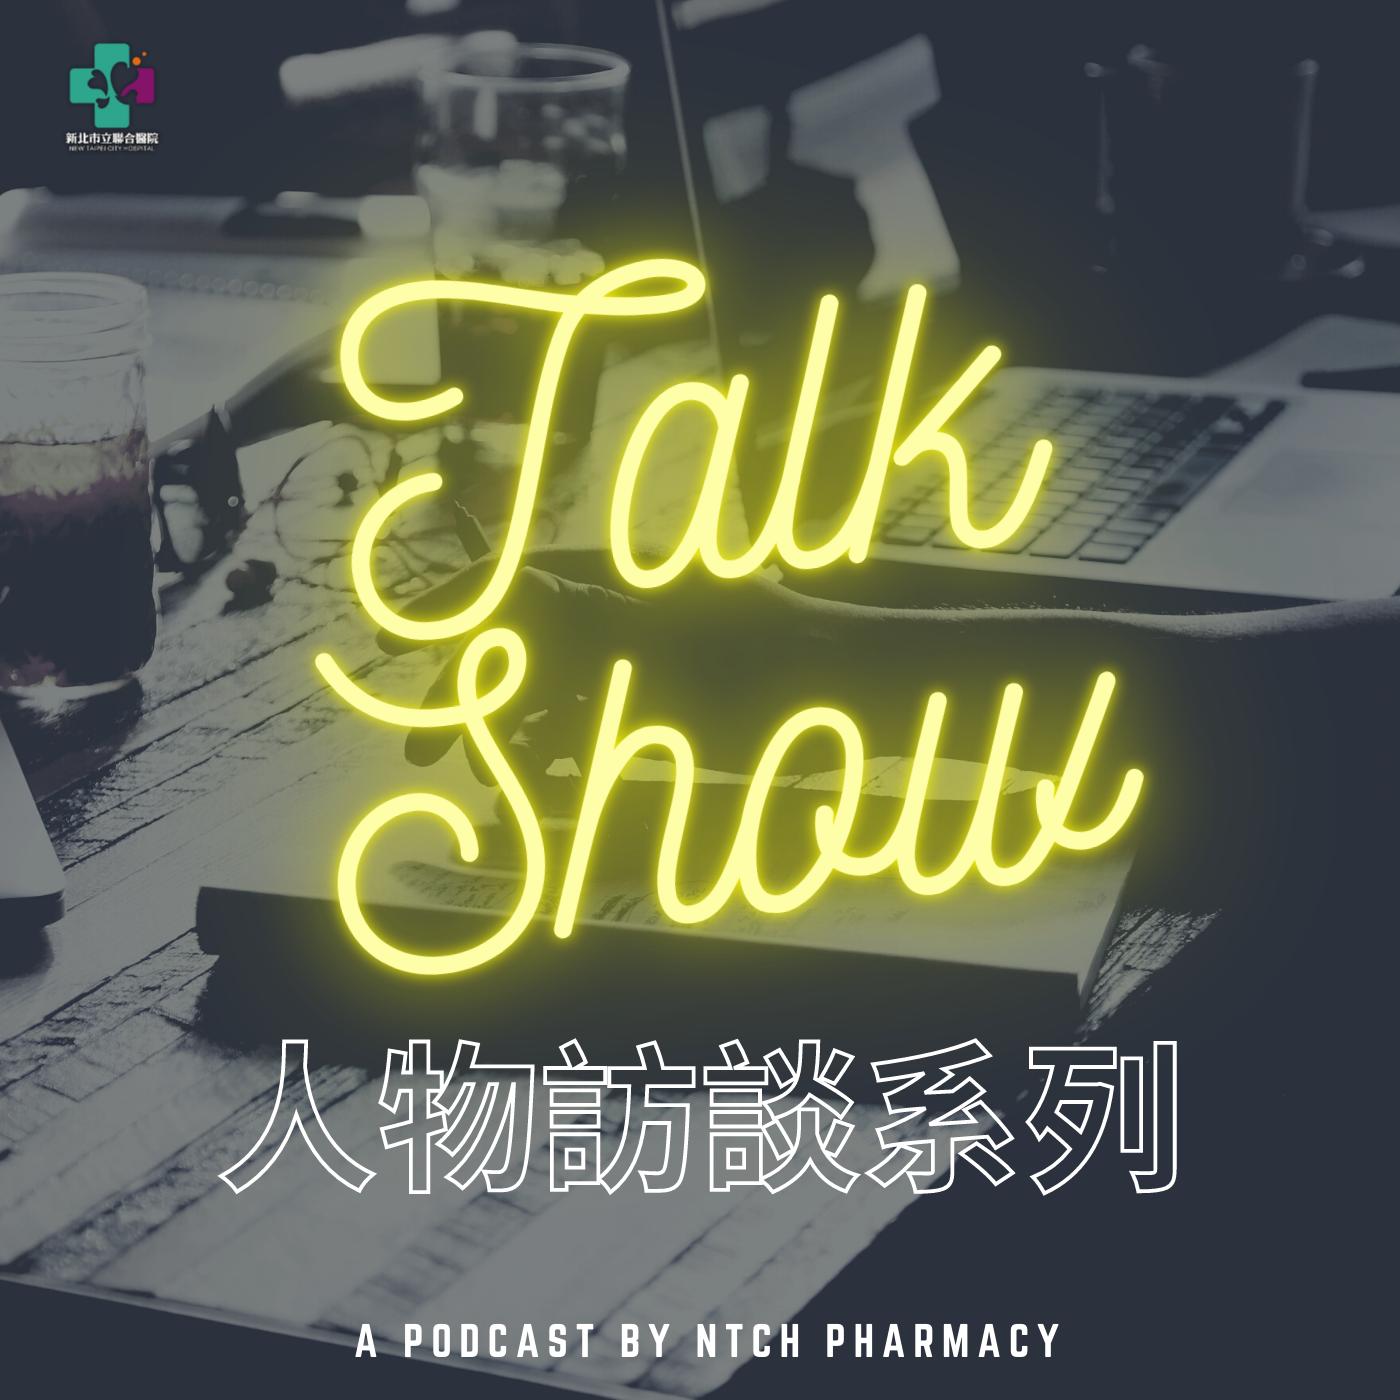 【 Talk Show 】EP.3 好餓~衝一發臺北捷運拉麵地圖!臺日拉麵分享